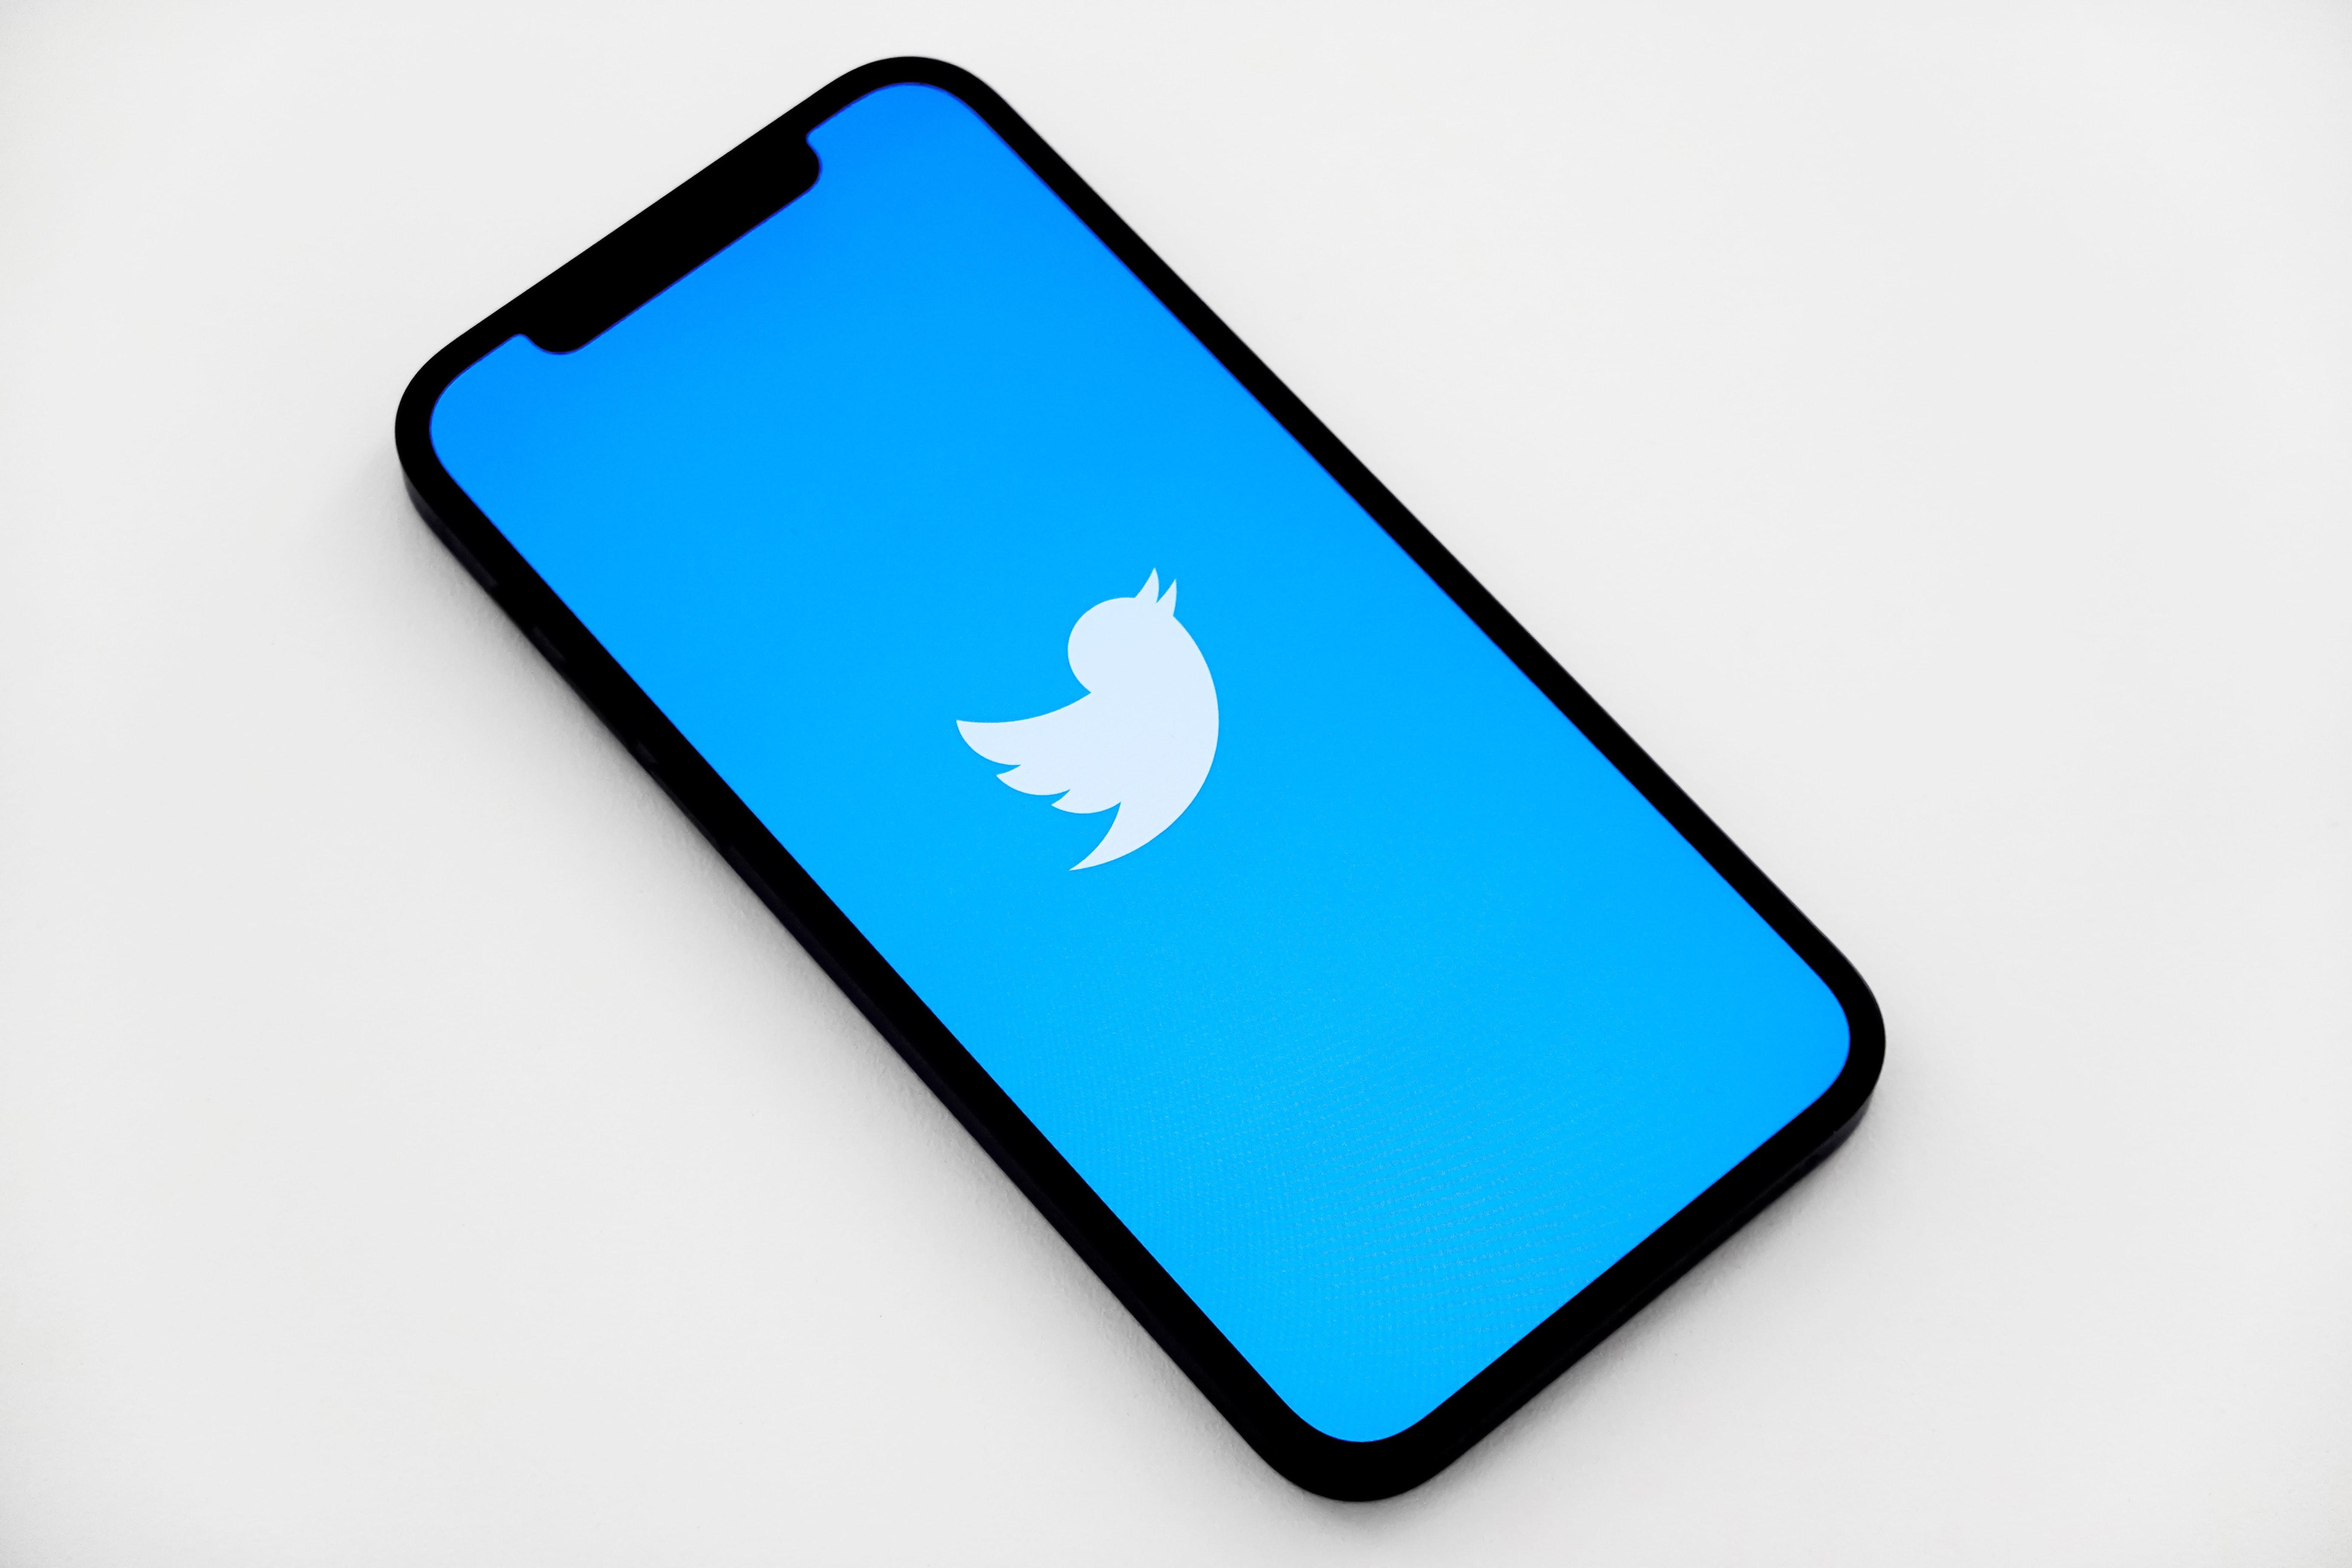 Can Social Media Companies Censor Lawmakers' Accounts?